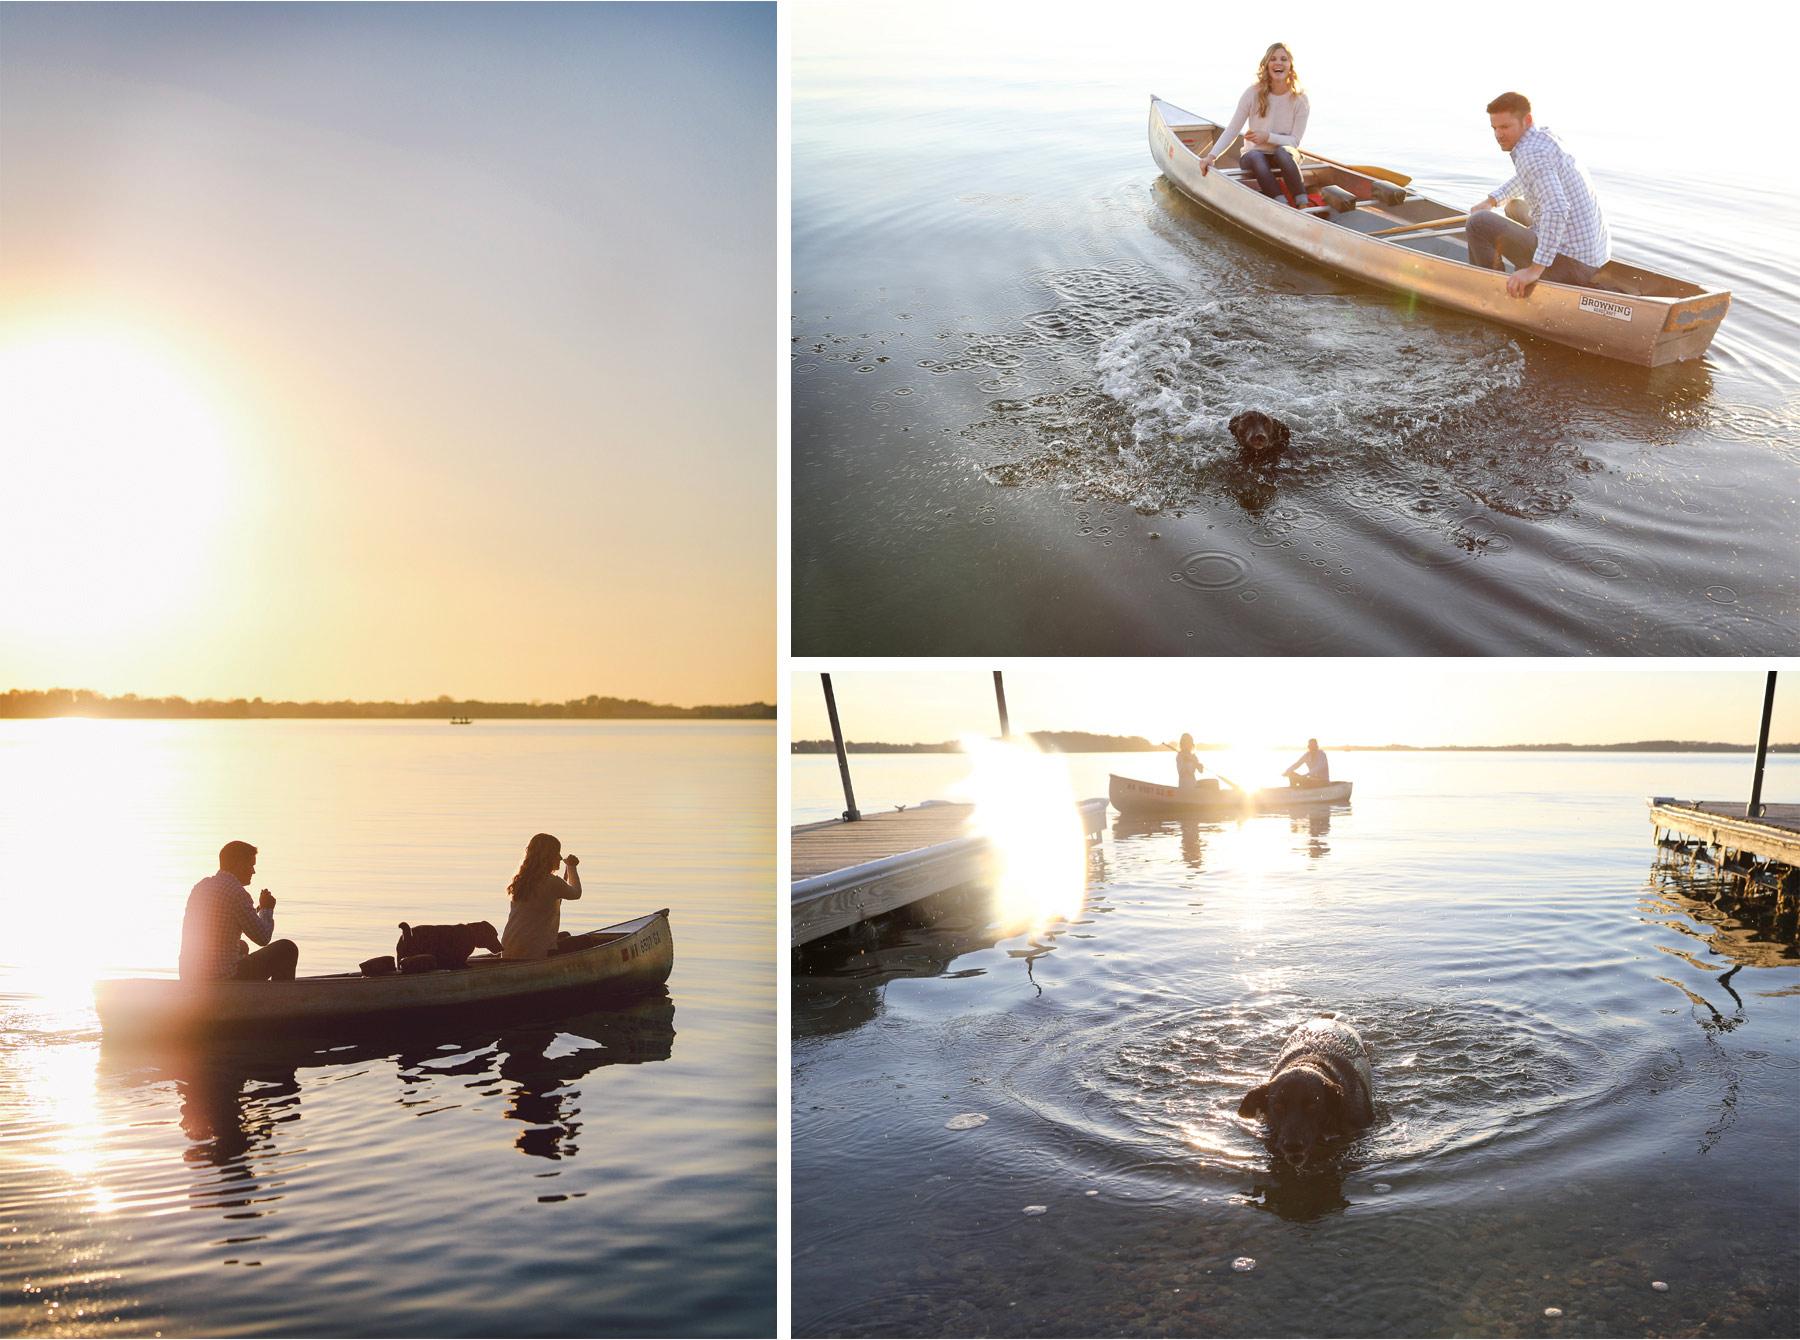 13-Vick-Photography-Destination-Engagement-Session-Canoe-Dog-Lake-Sunset-Katie-and-Bob.jpg